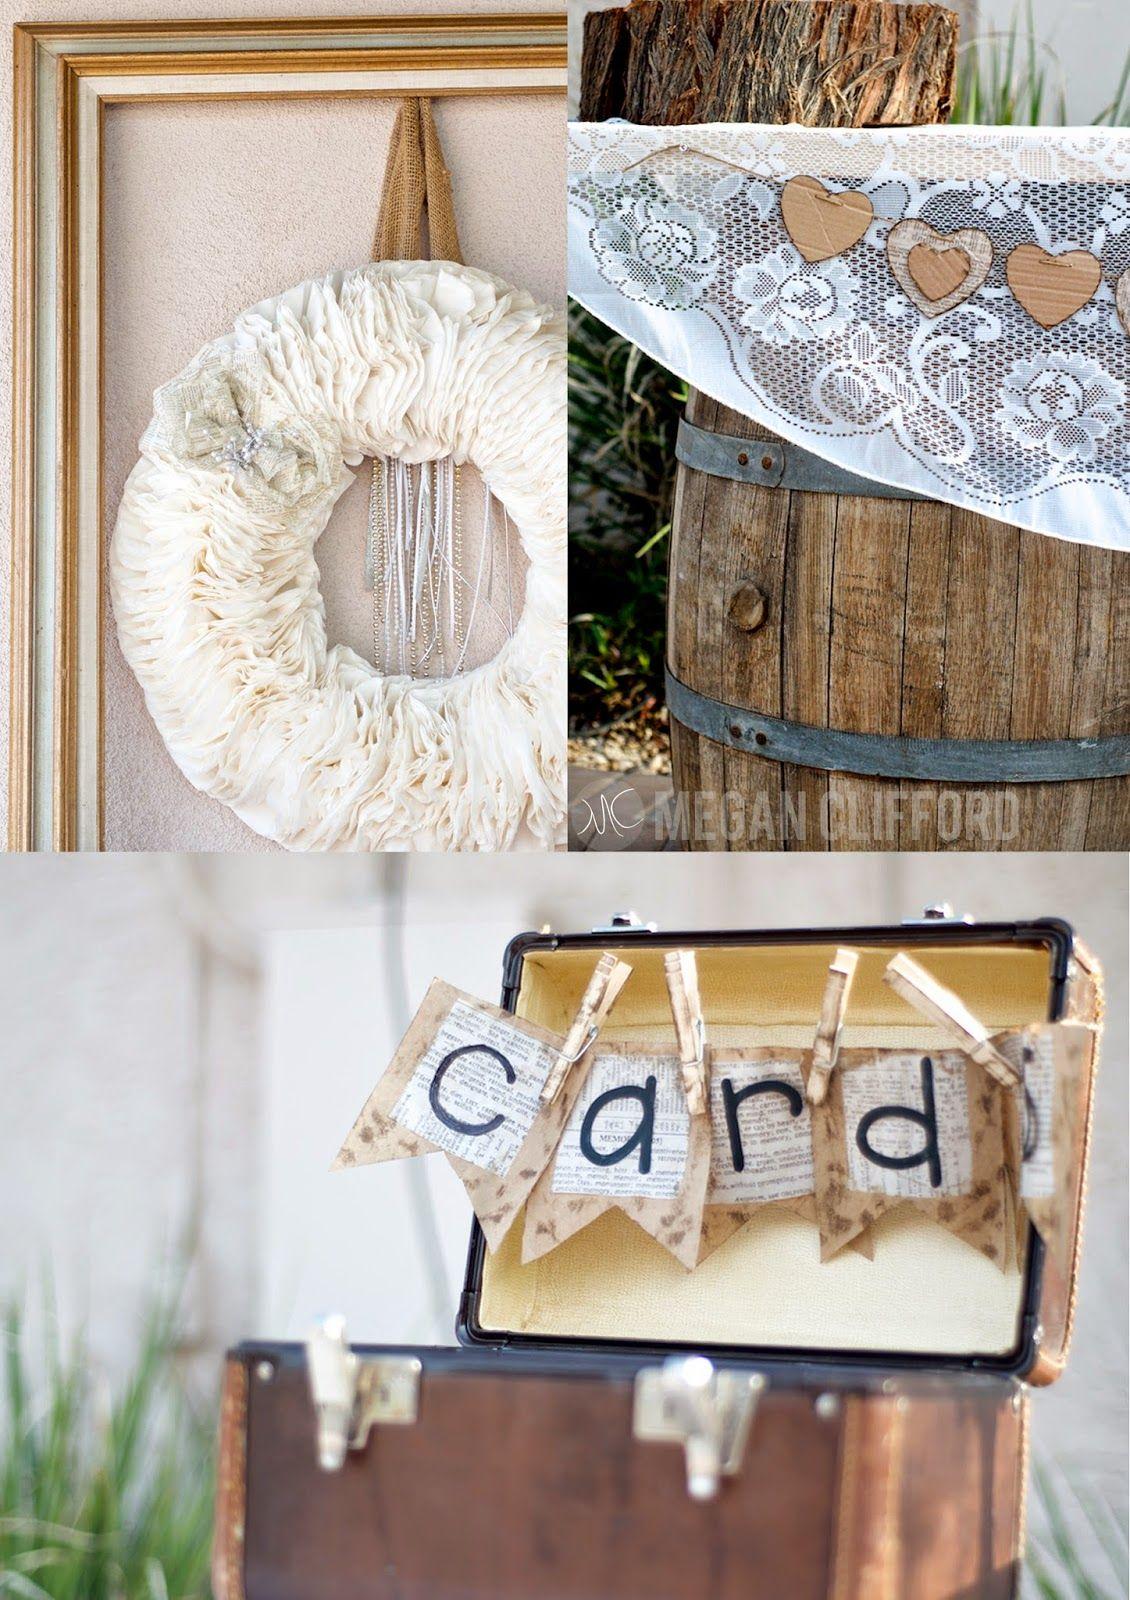 Wedding decorations house  DIY wedding decor and ideas rustic and beautiful wedding in arizona